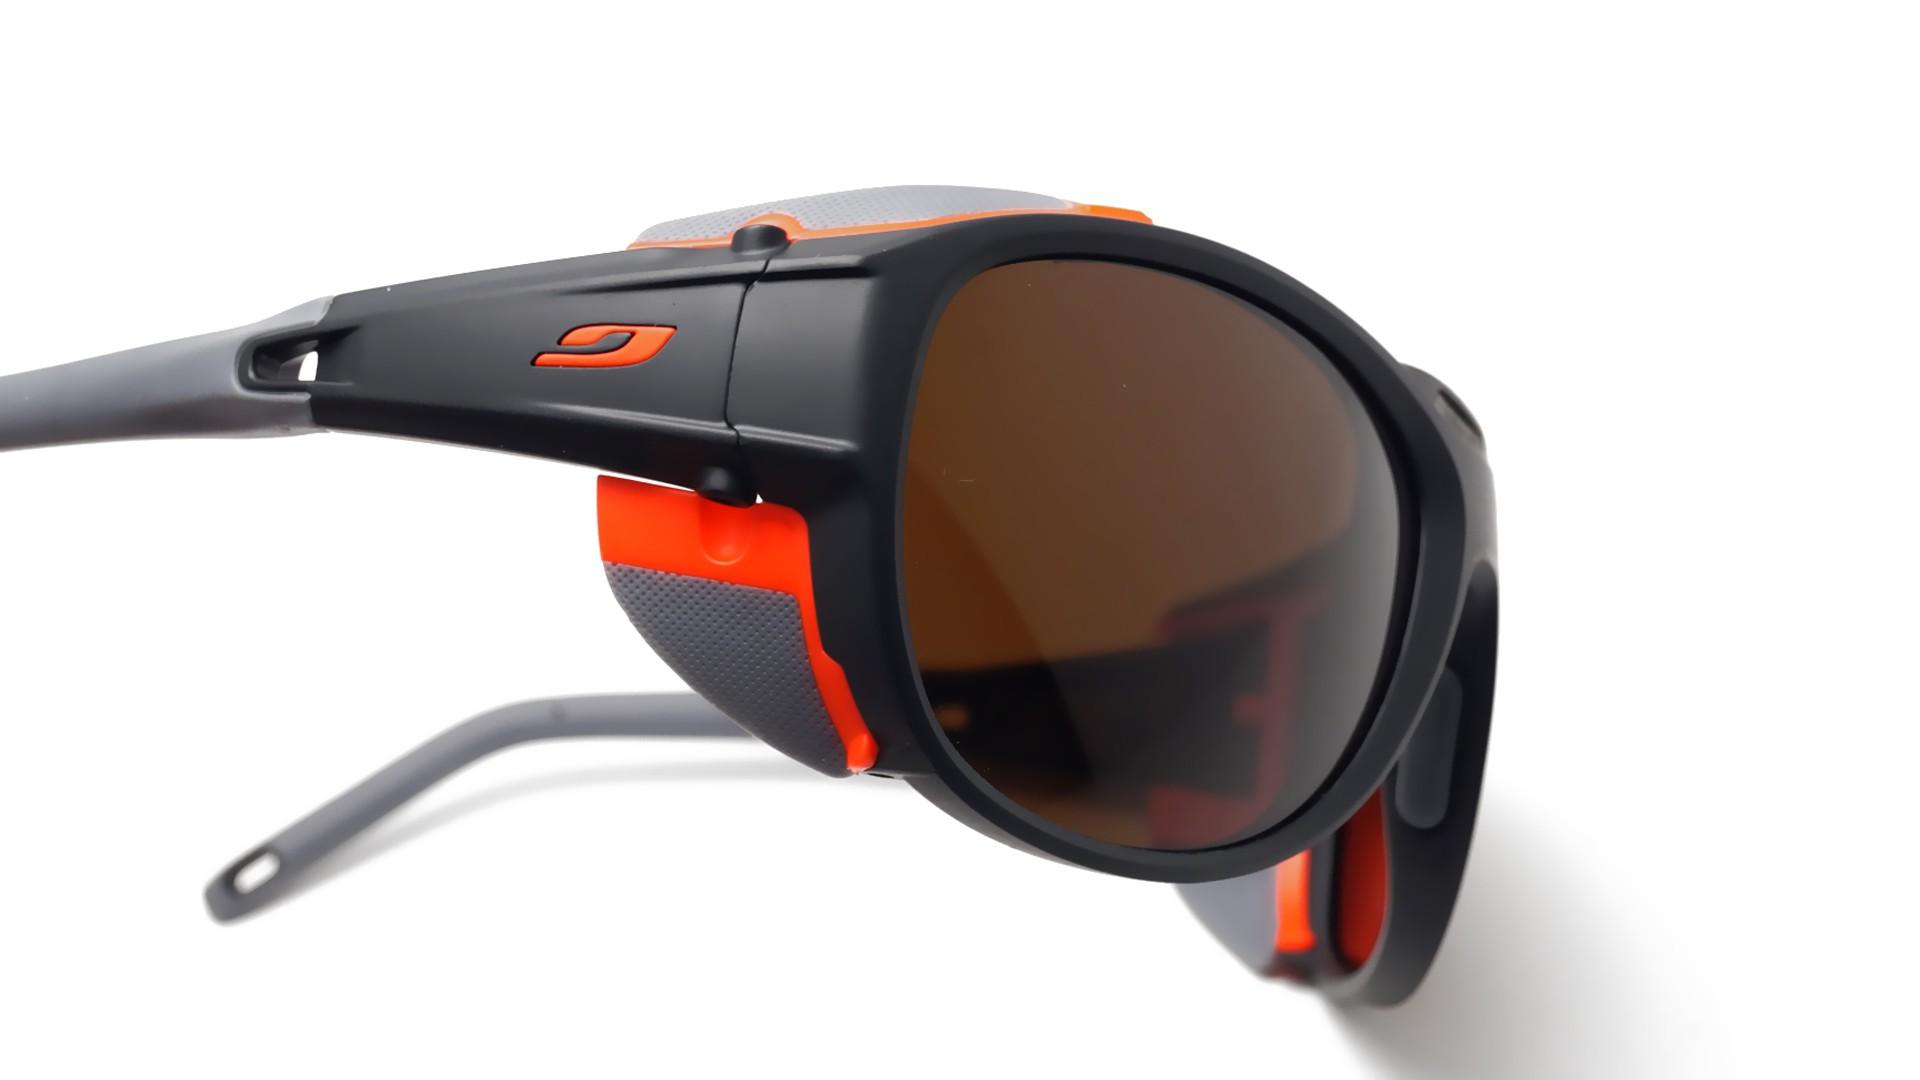 ca0e4acdf6 Sunglasses Julbo Explorer 2.0 Black Matte J497 6121 61-11 Medium